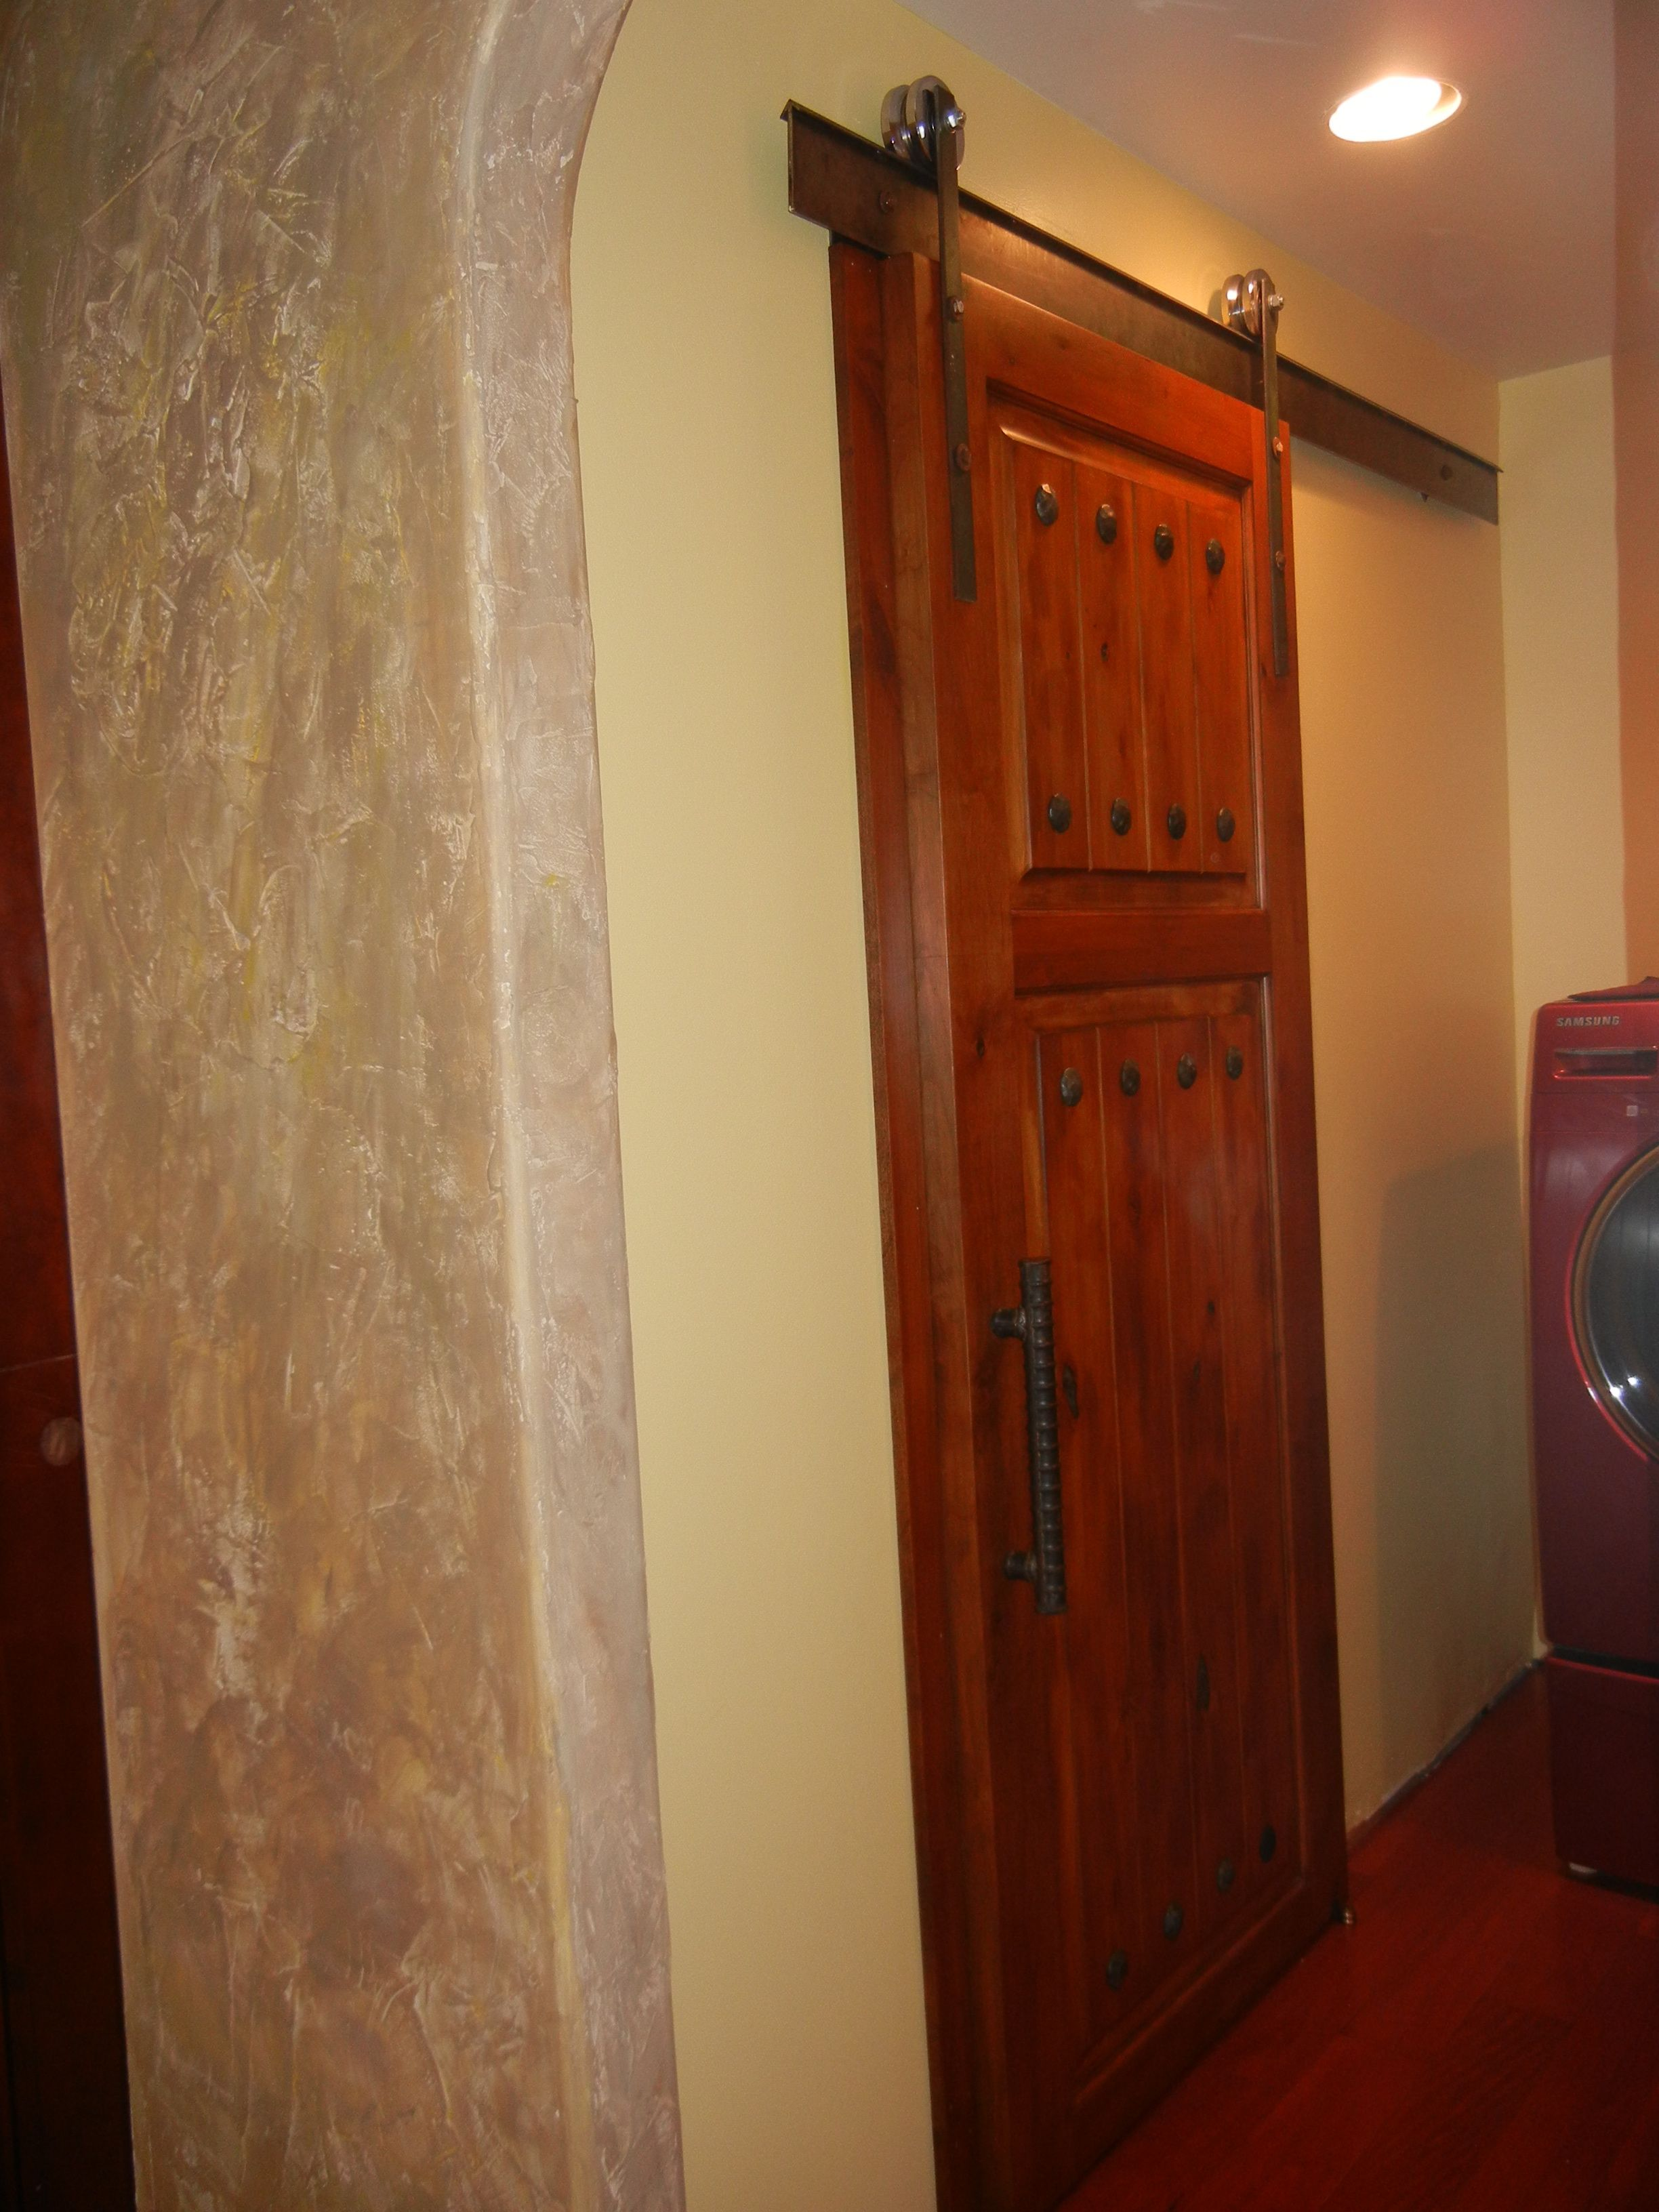 Barn Door Leading To A Rustic Bathroom Home Ideas